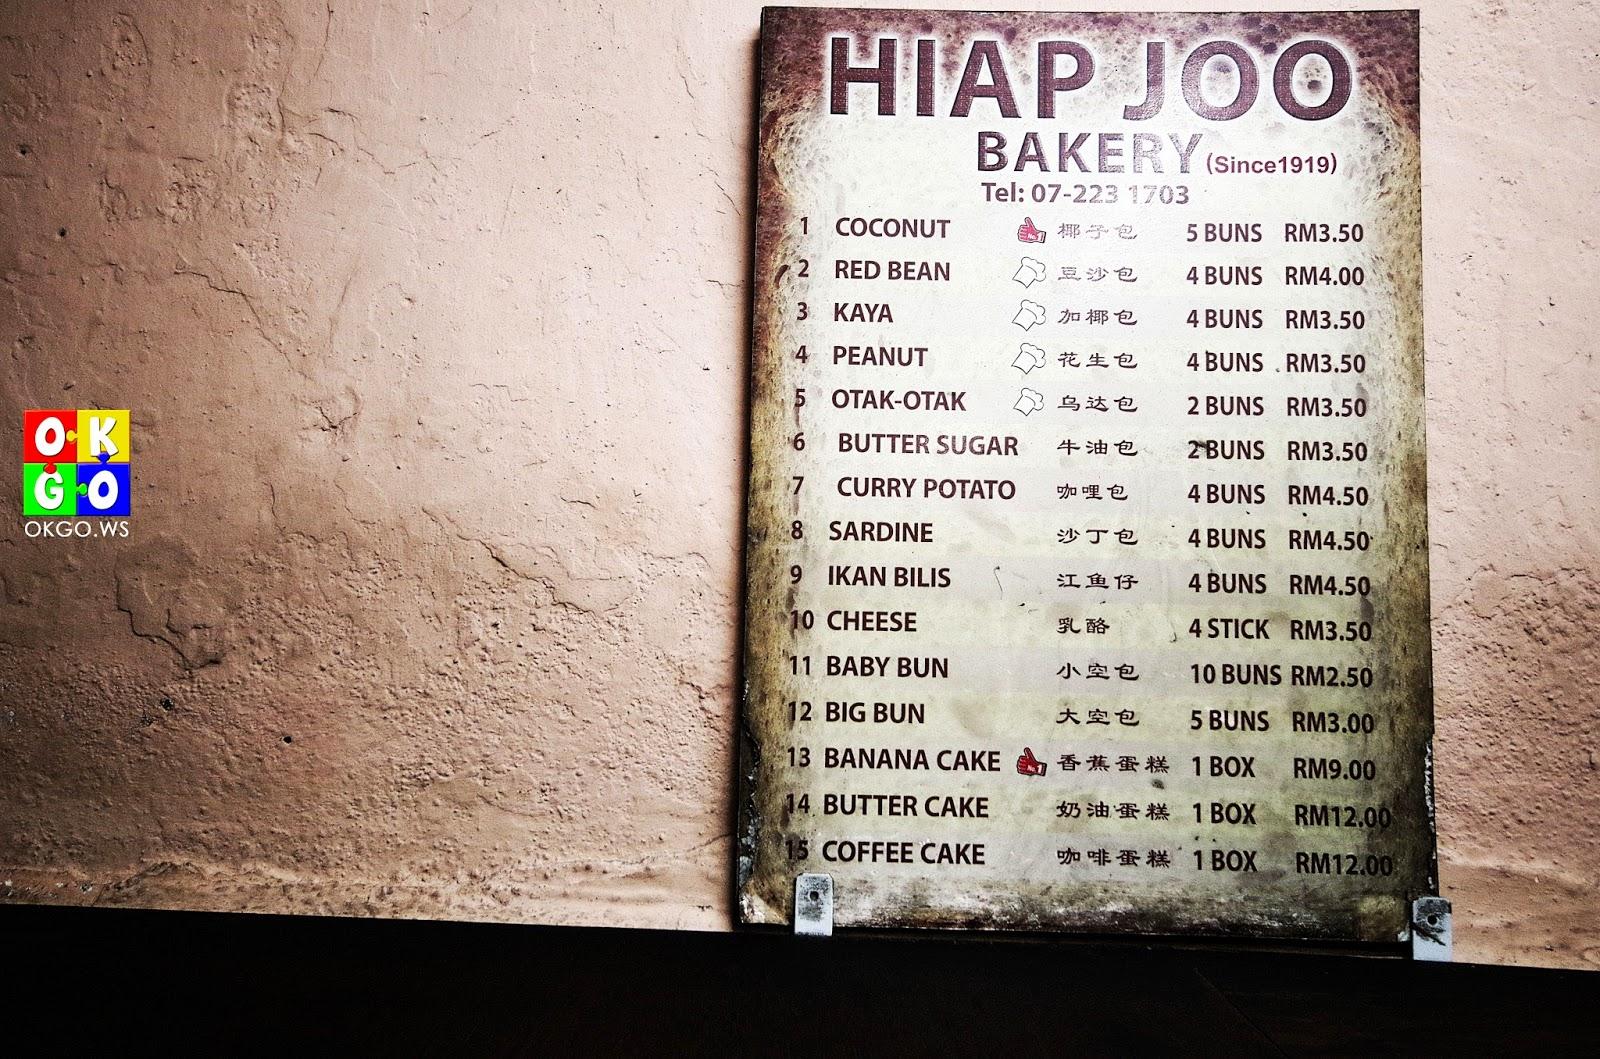 Hiap Joo Bakery price list